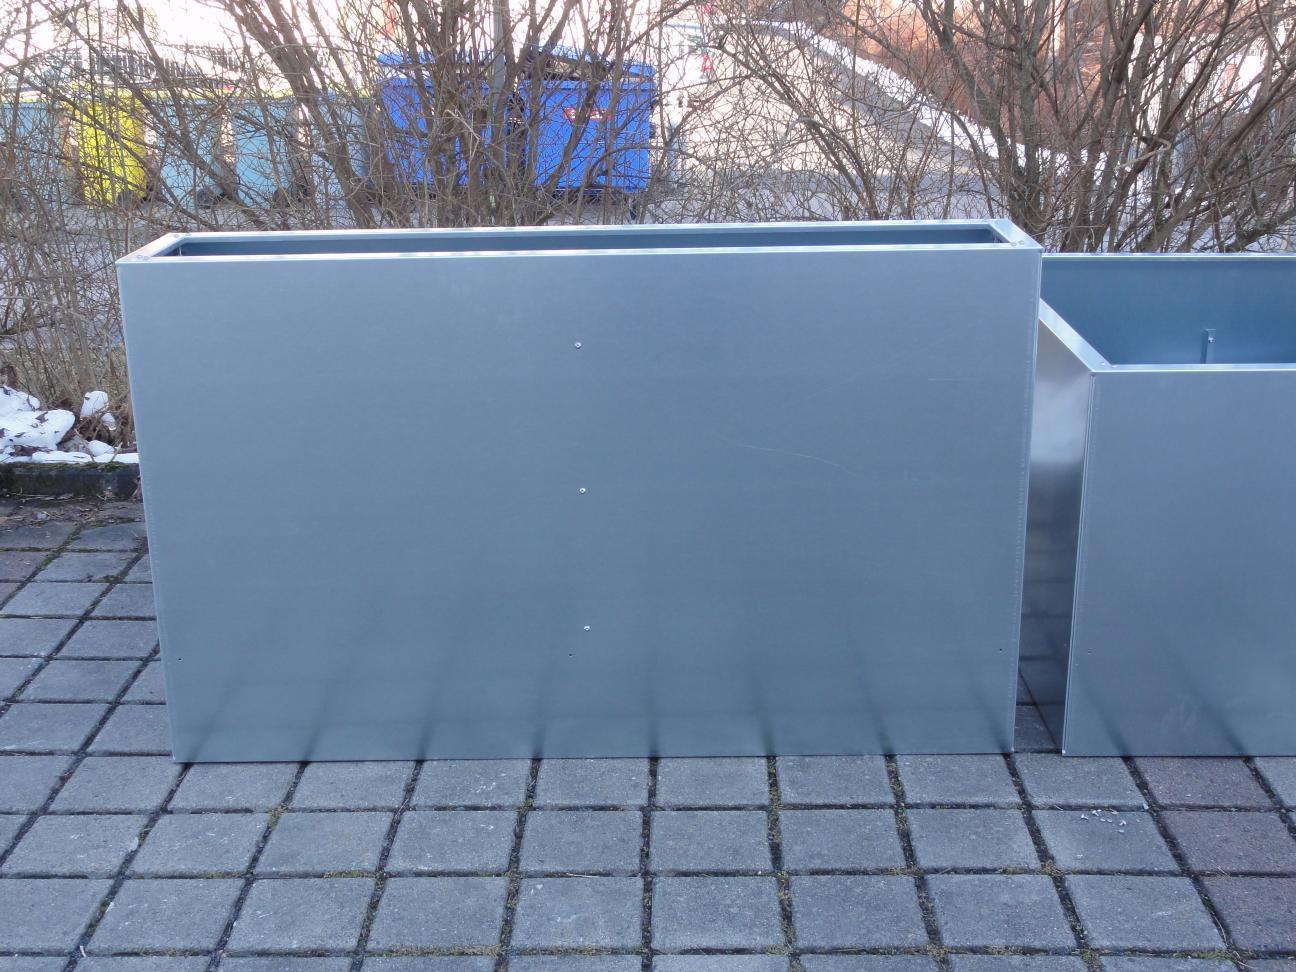 hochbeet urban metall 0 75m x 1 5 m h he 0 5 m verzinkt. Black Bedroom Furniture Sets. Home Design Ideas